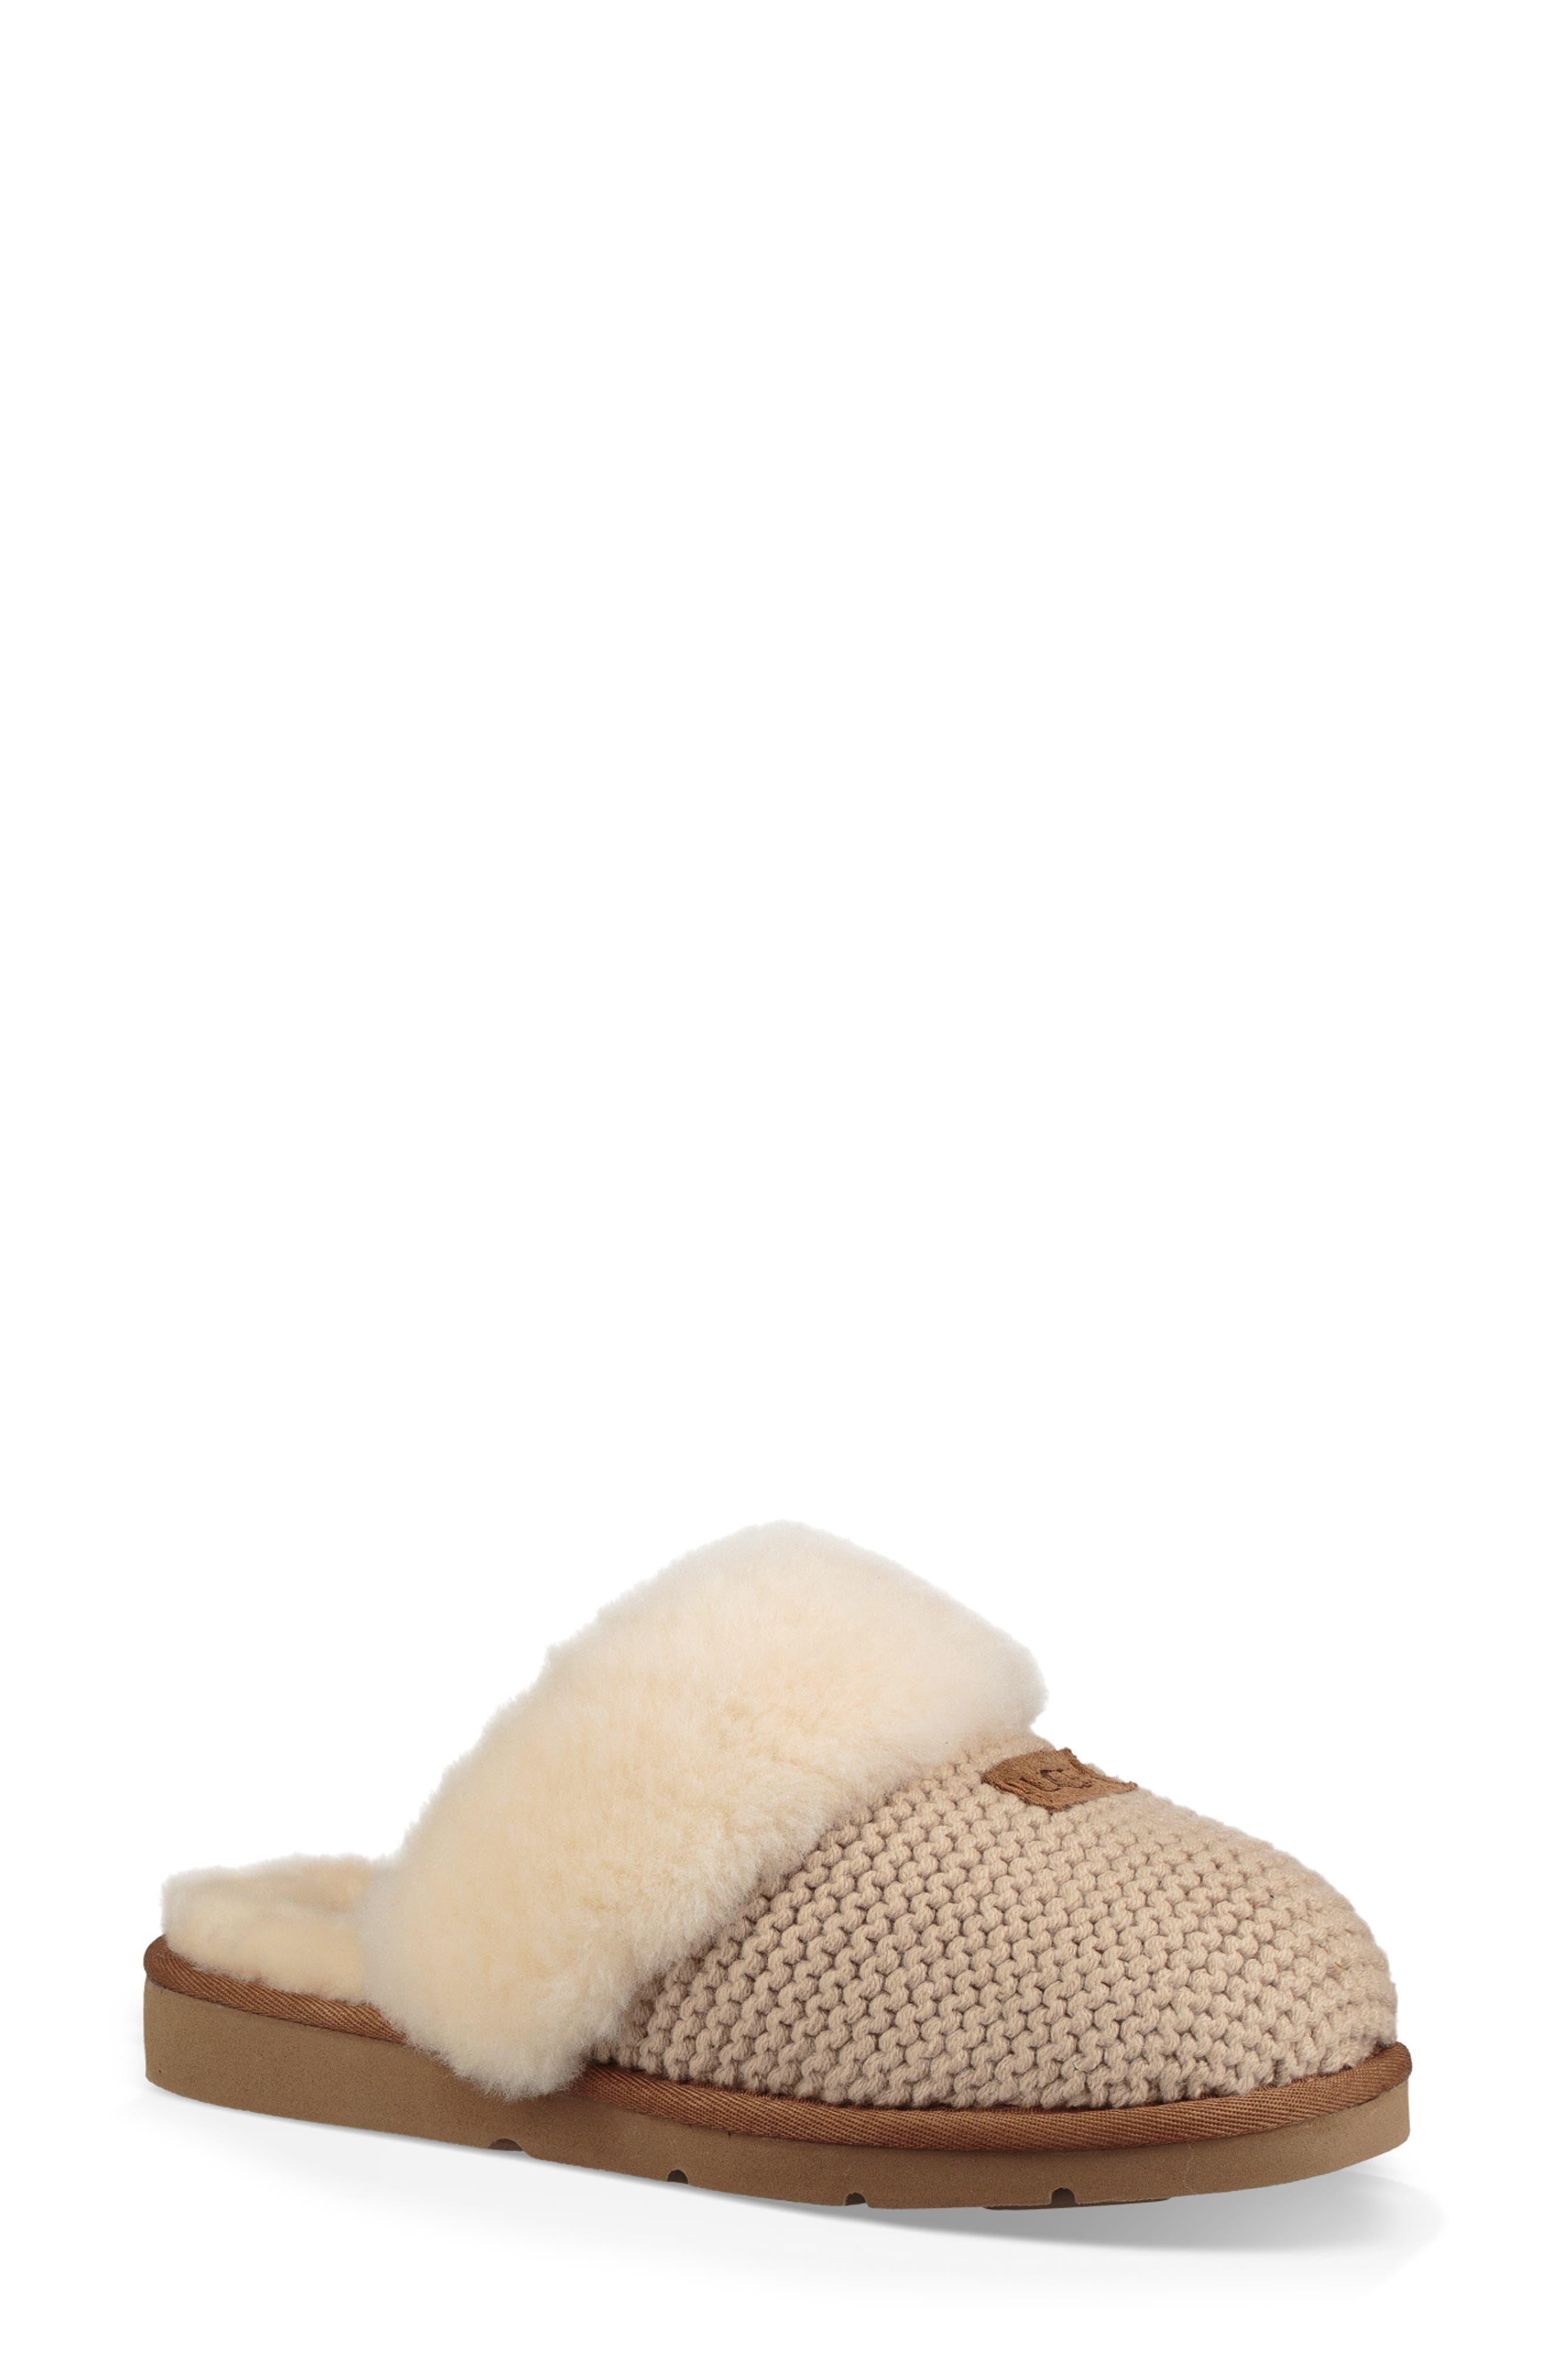 Ugg Cozy Knit Genuine Shearling Slipper, Ivory